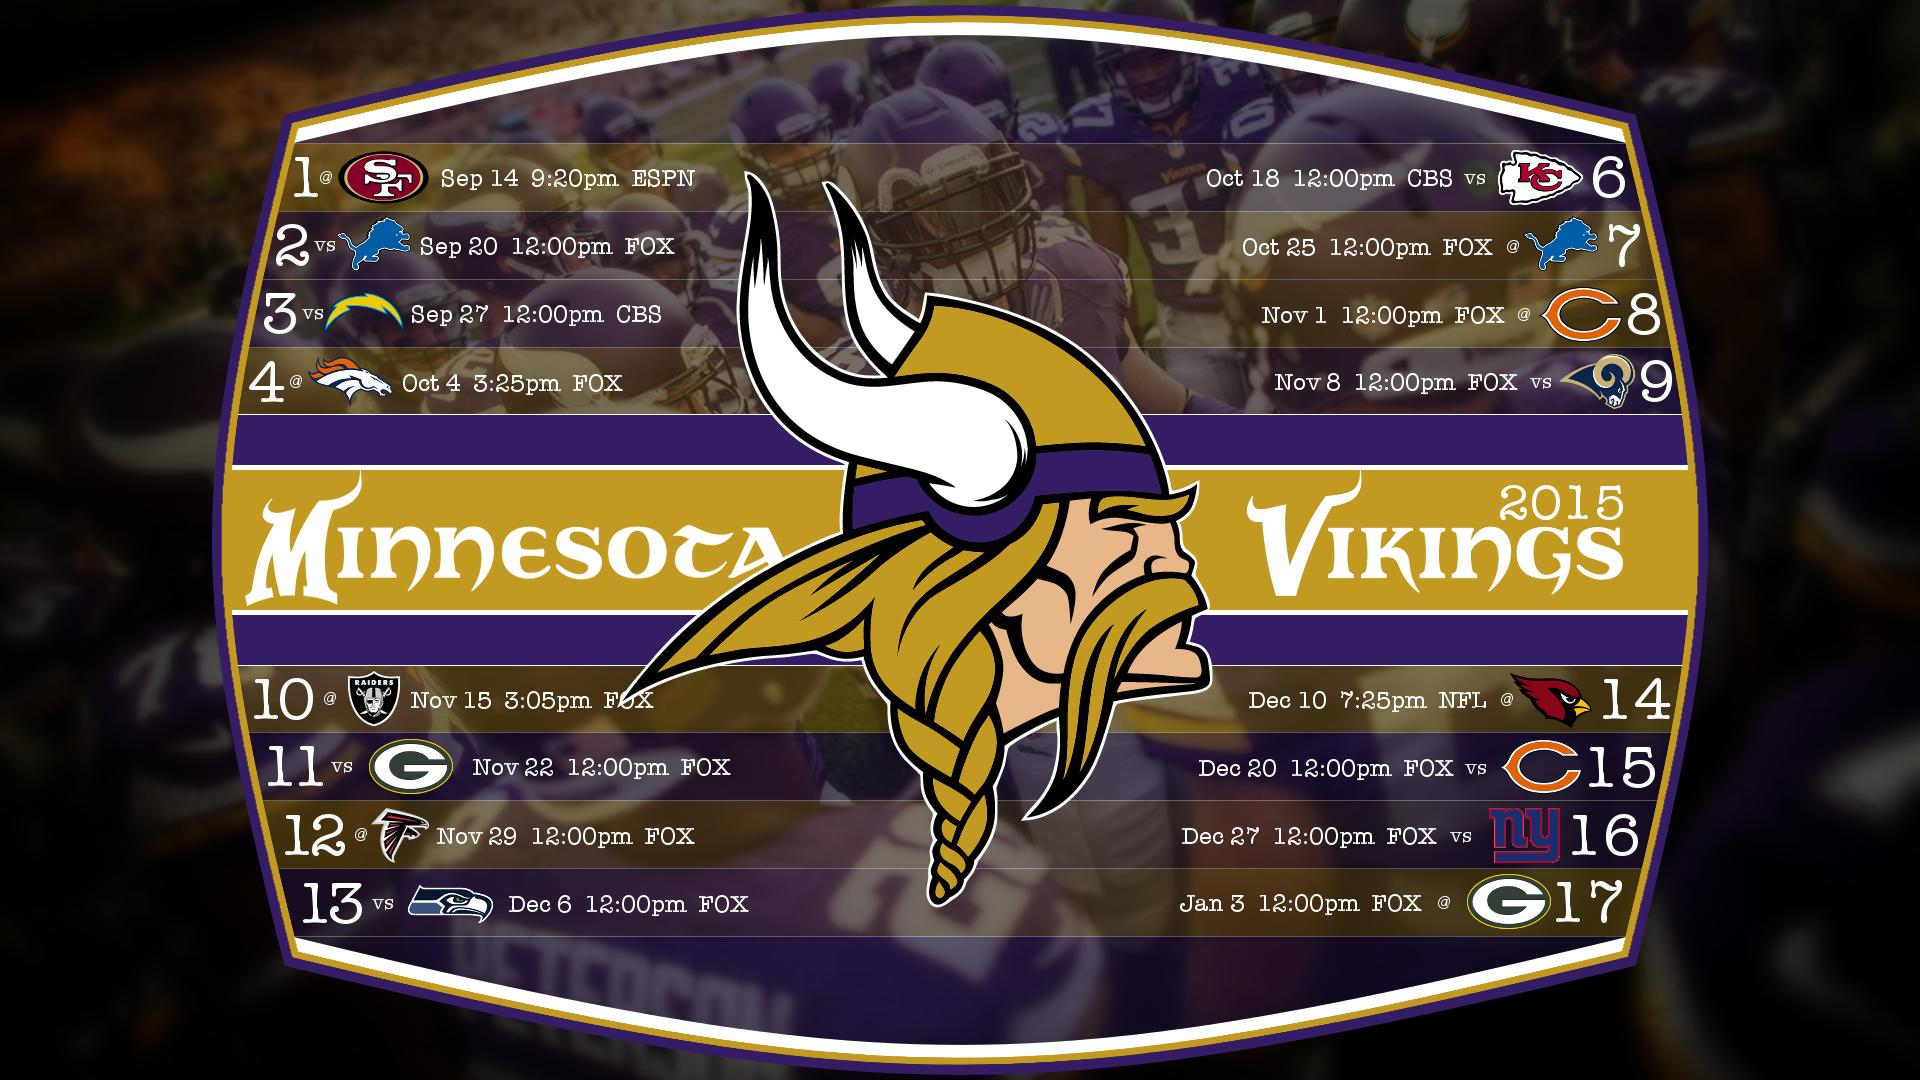 Minnesota Vikings 2015 Schedule Wallpaper CHGLand.info